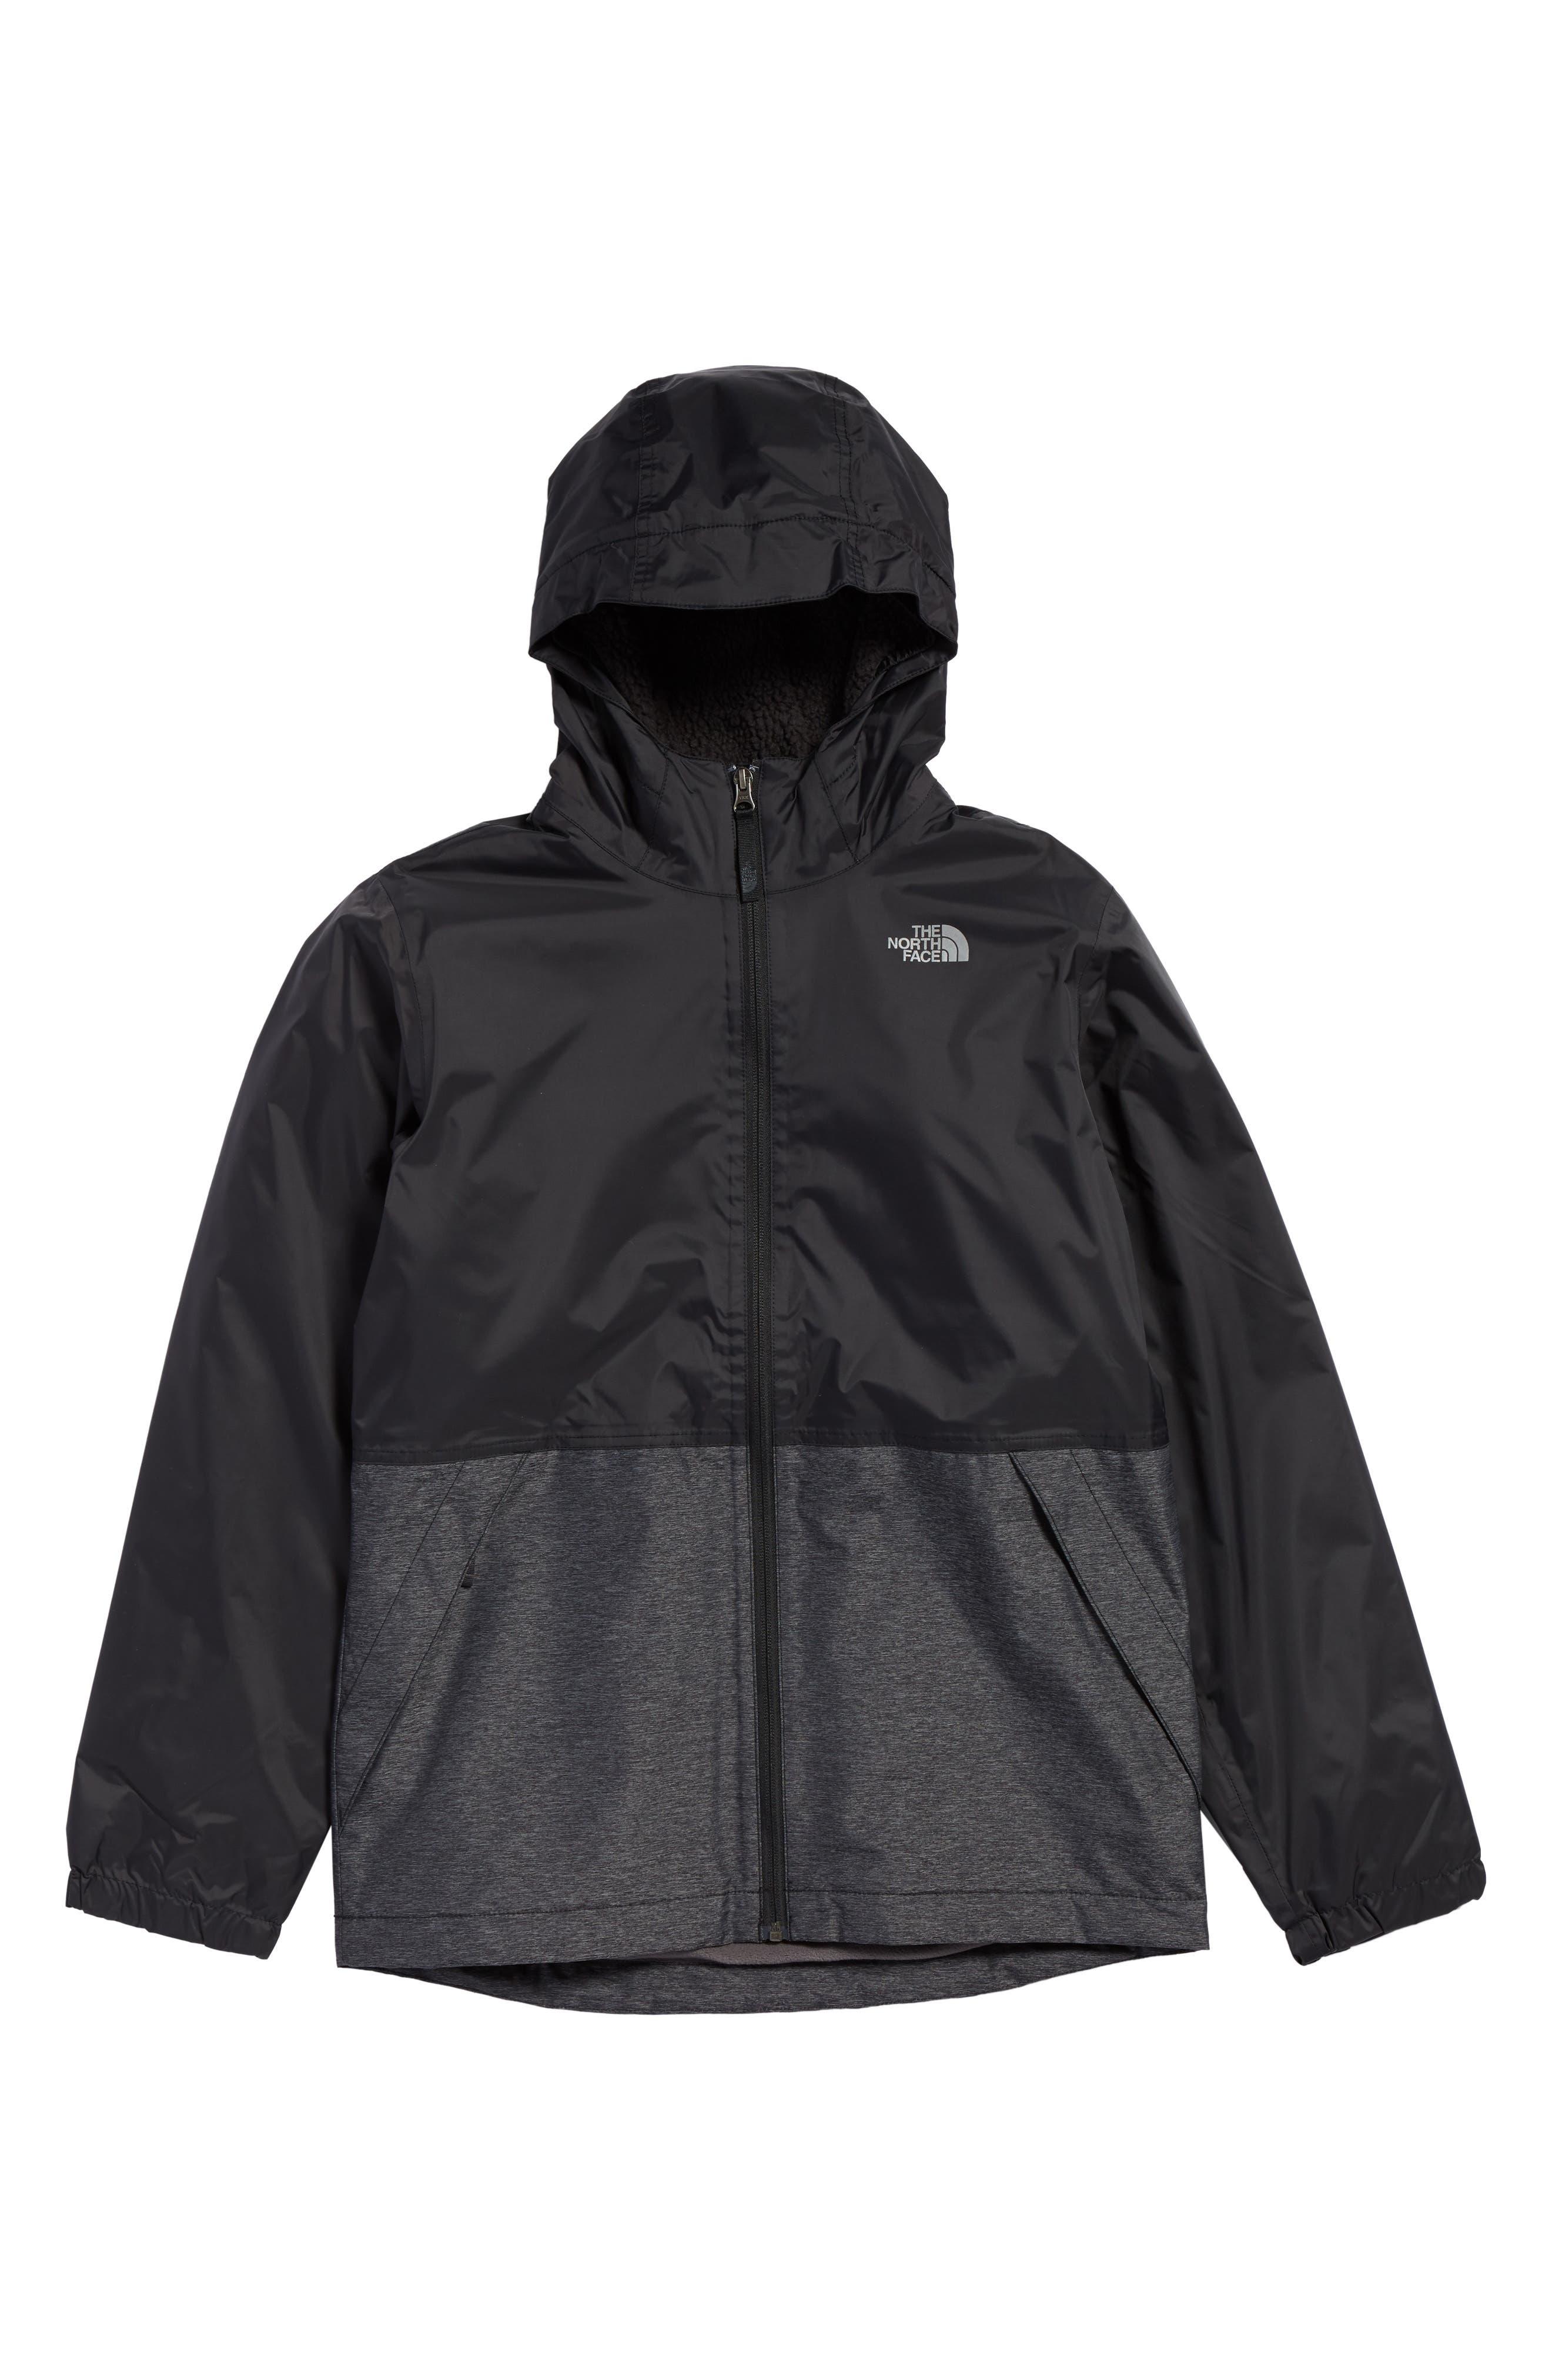 Warm Storm Hooded Waterproof Jacket,                         Main,                         color, Tnf Black